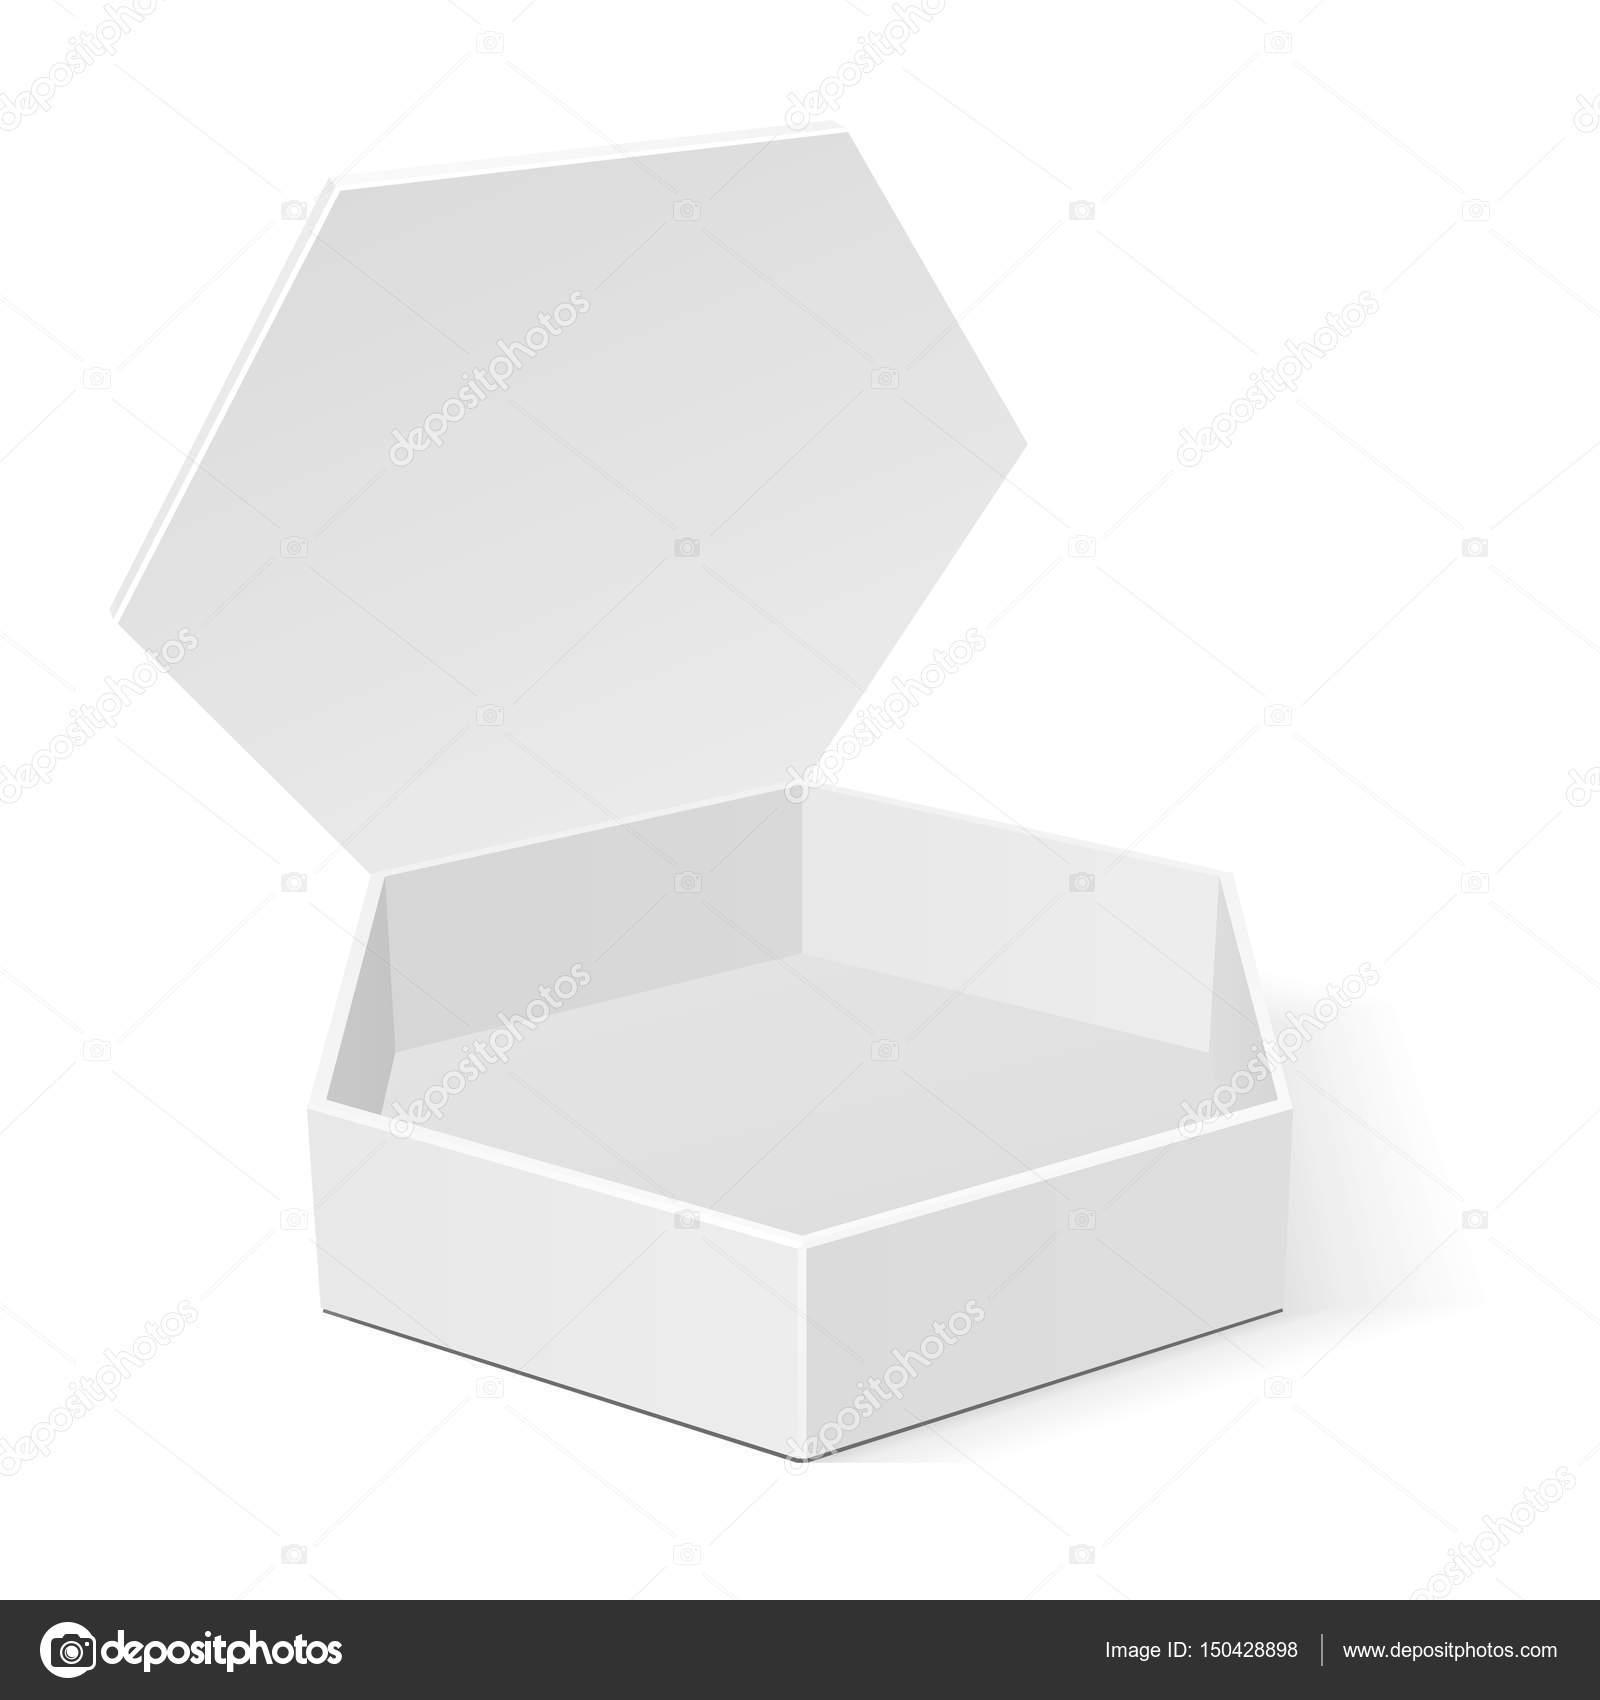 blanc six pans creux en carton bo te d emballage d. Black Bedroom Furniture Sets. Home Design Ideas